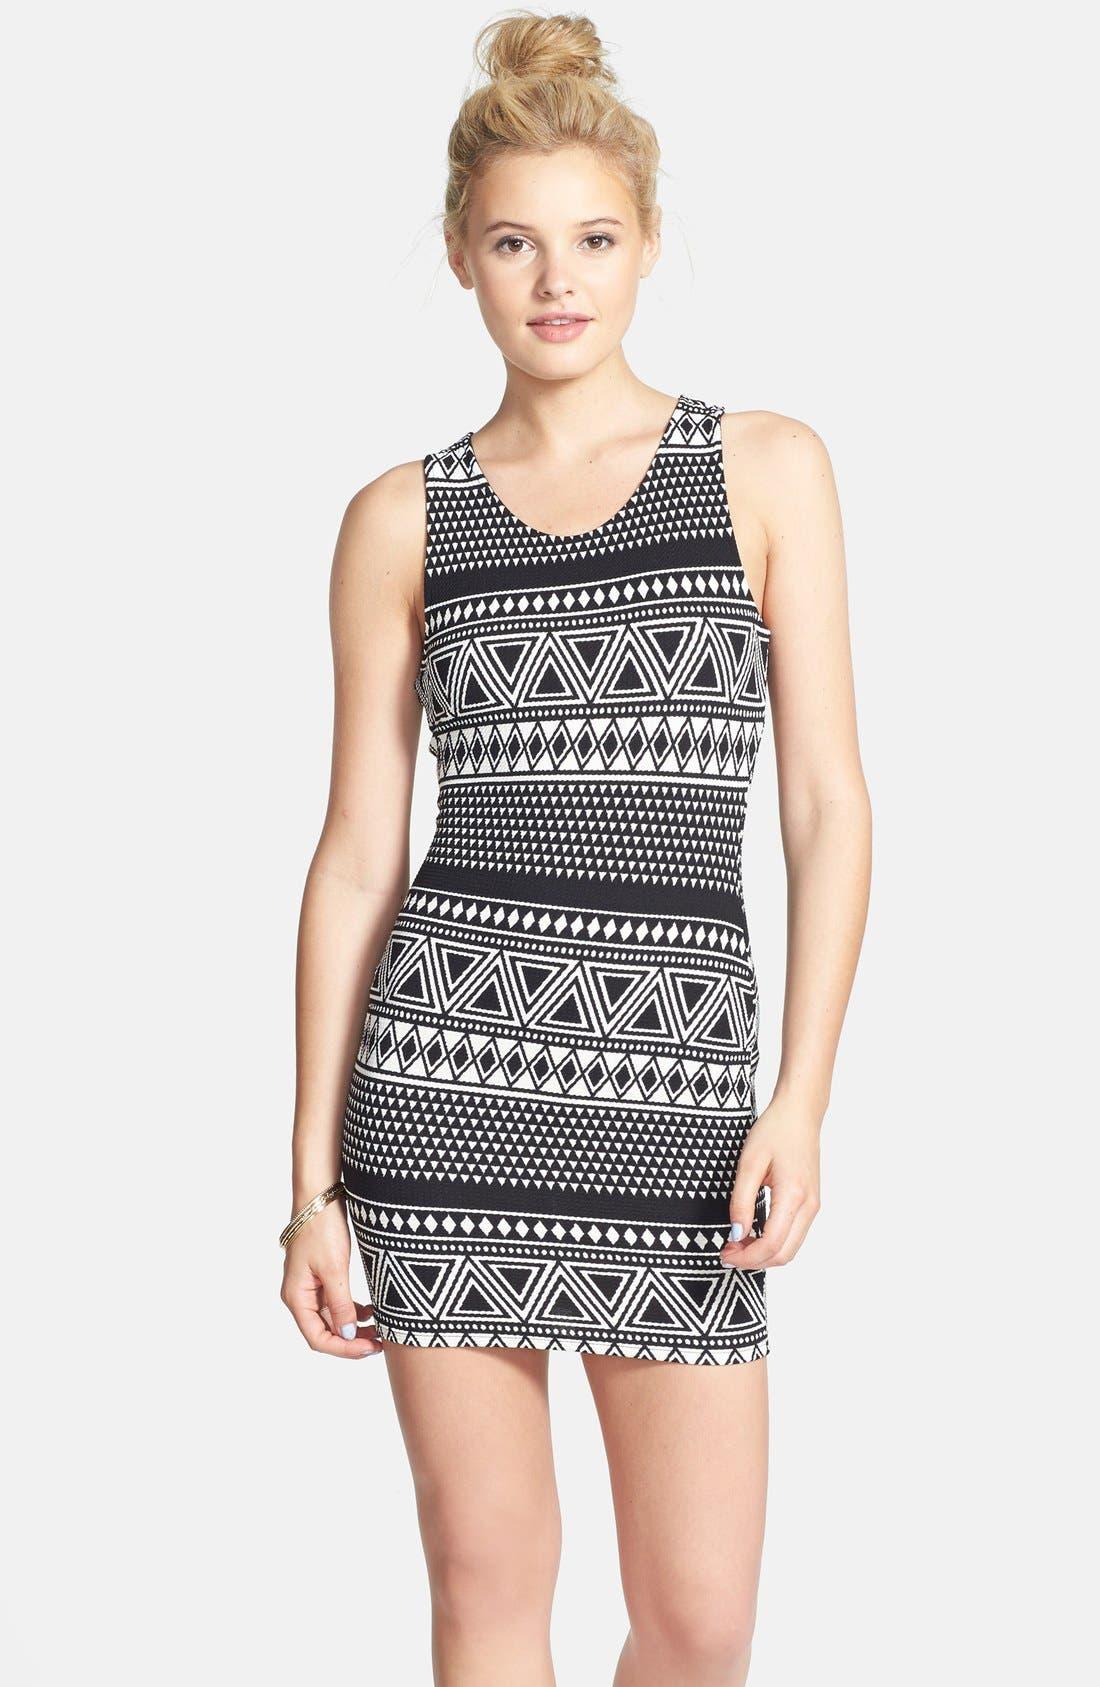 Alternate Image 1 Selected - Elodie Cutout Back Body-Con Dress (Juniors)